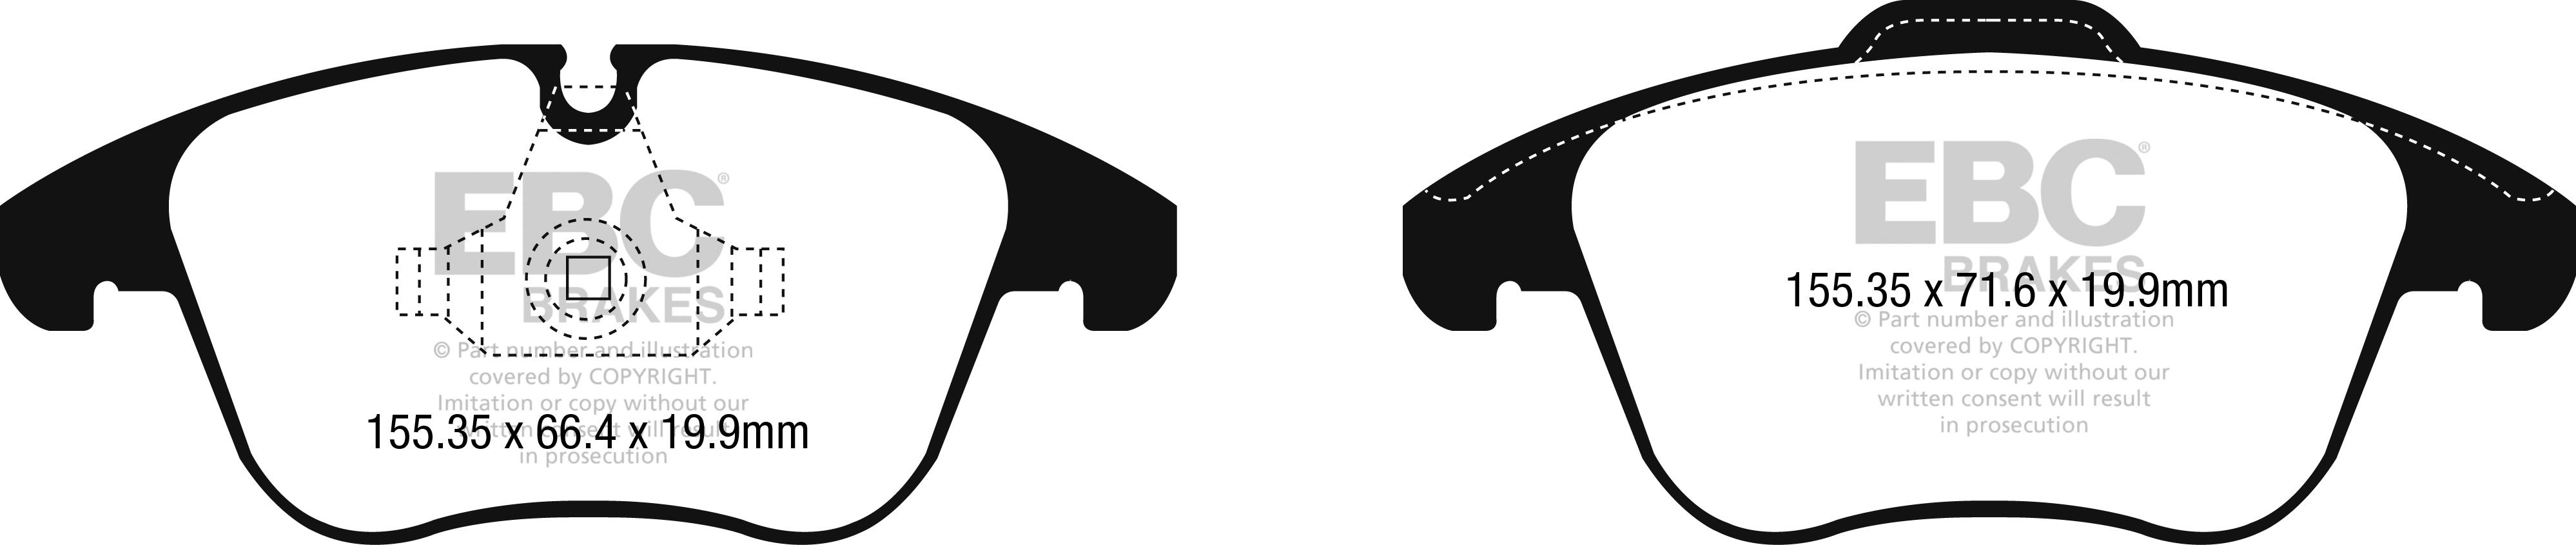 EBC DP22251 Greenstuff brake pad set front